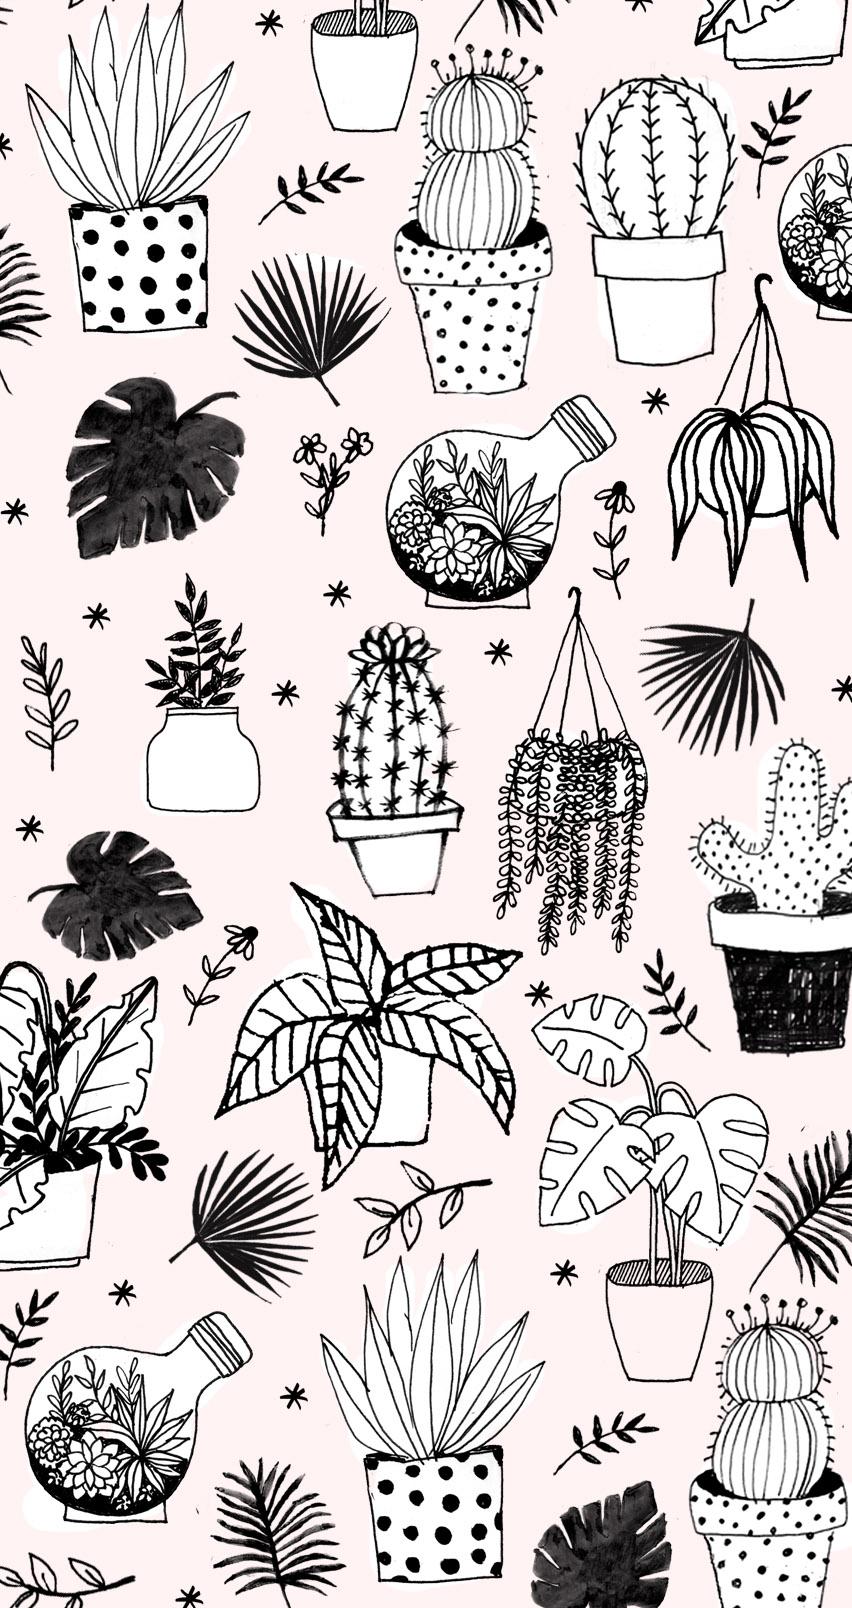 plantwallpaper.jpg